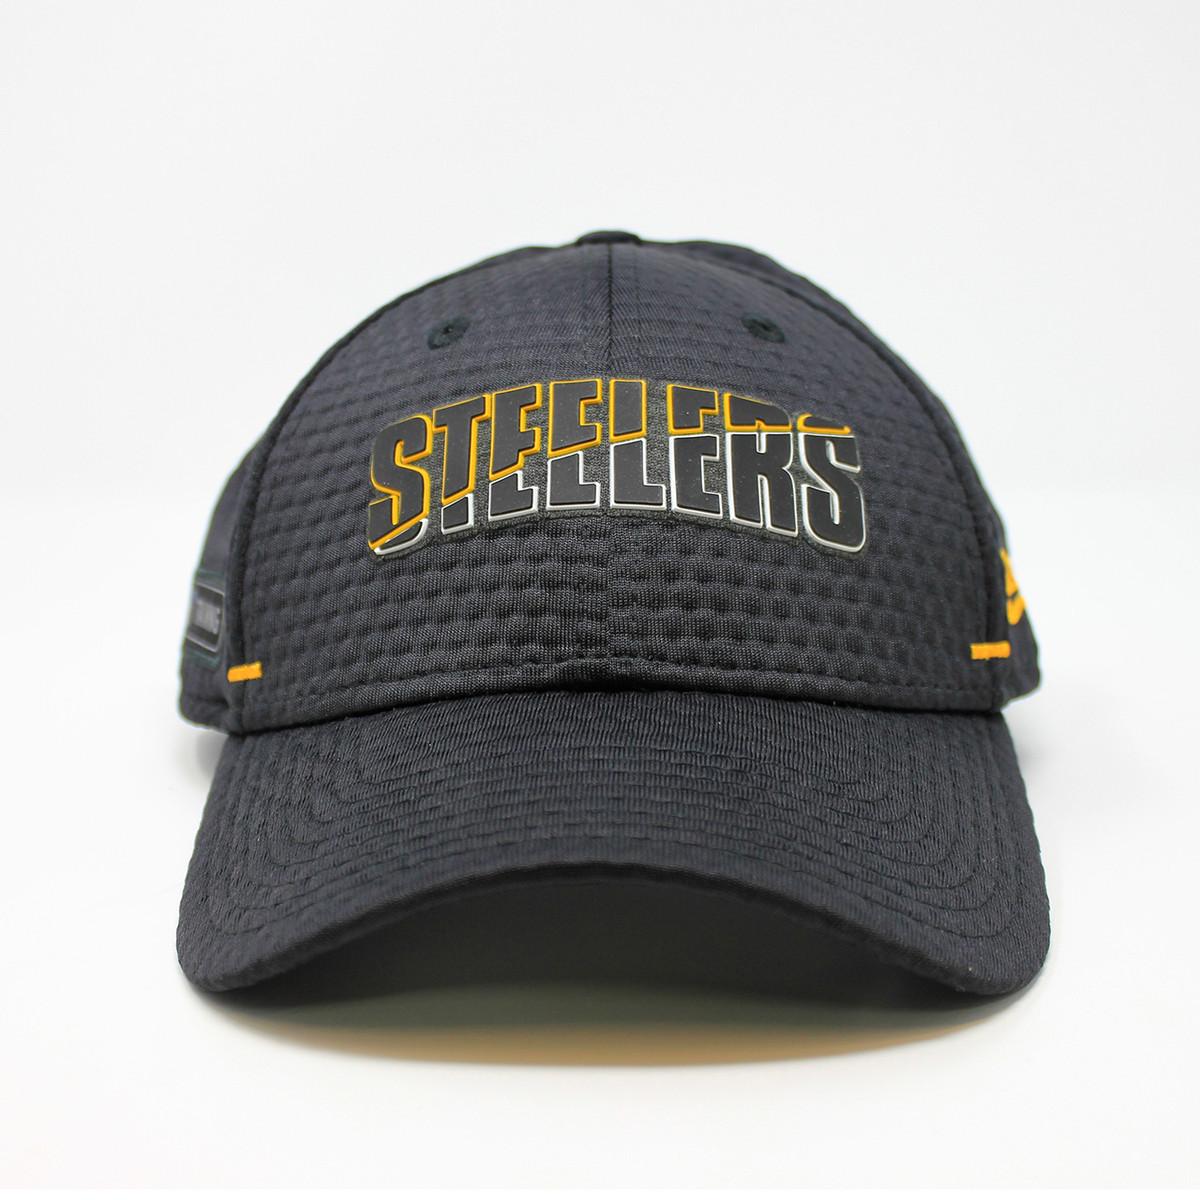 New Era 39Thirty Steelers 2020 Training Cap Adj